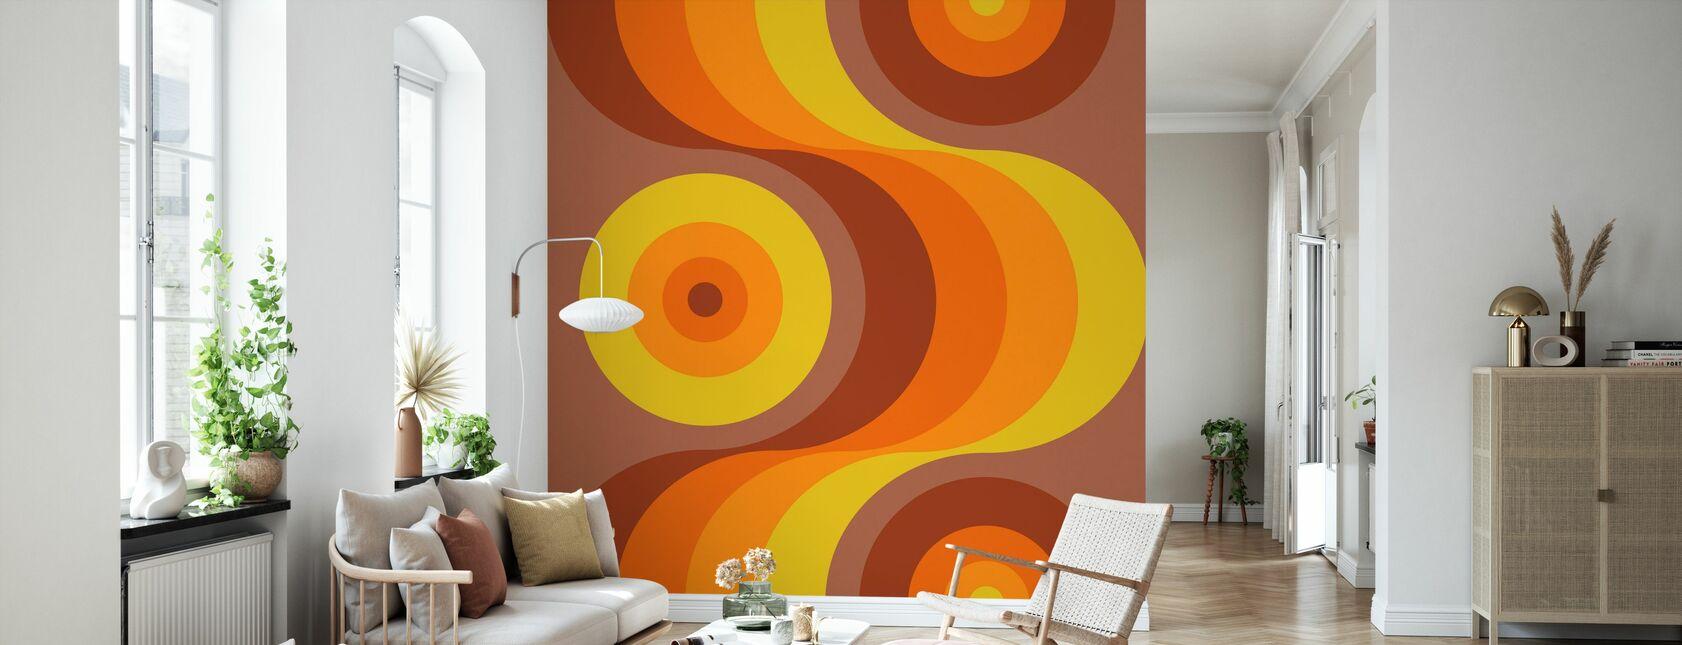 Retro Orange - Wallpaper - Living Room